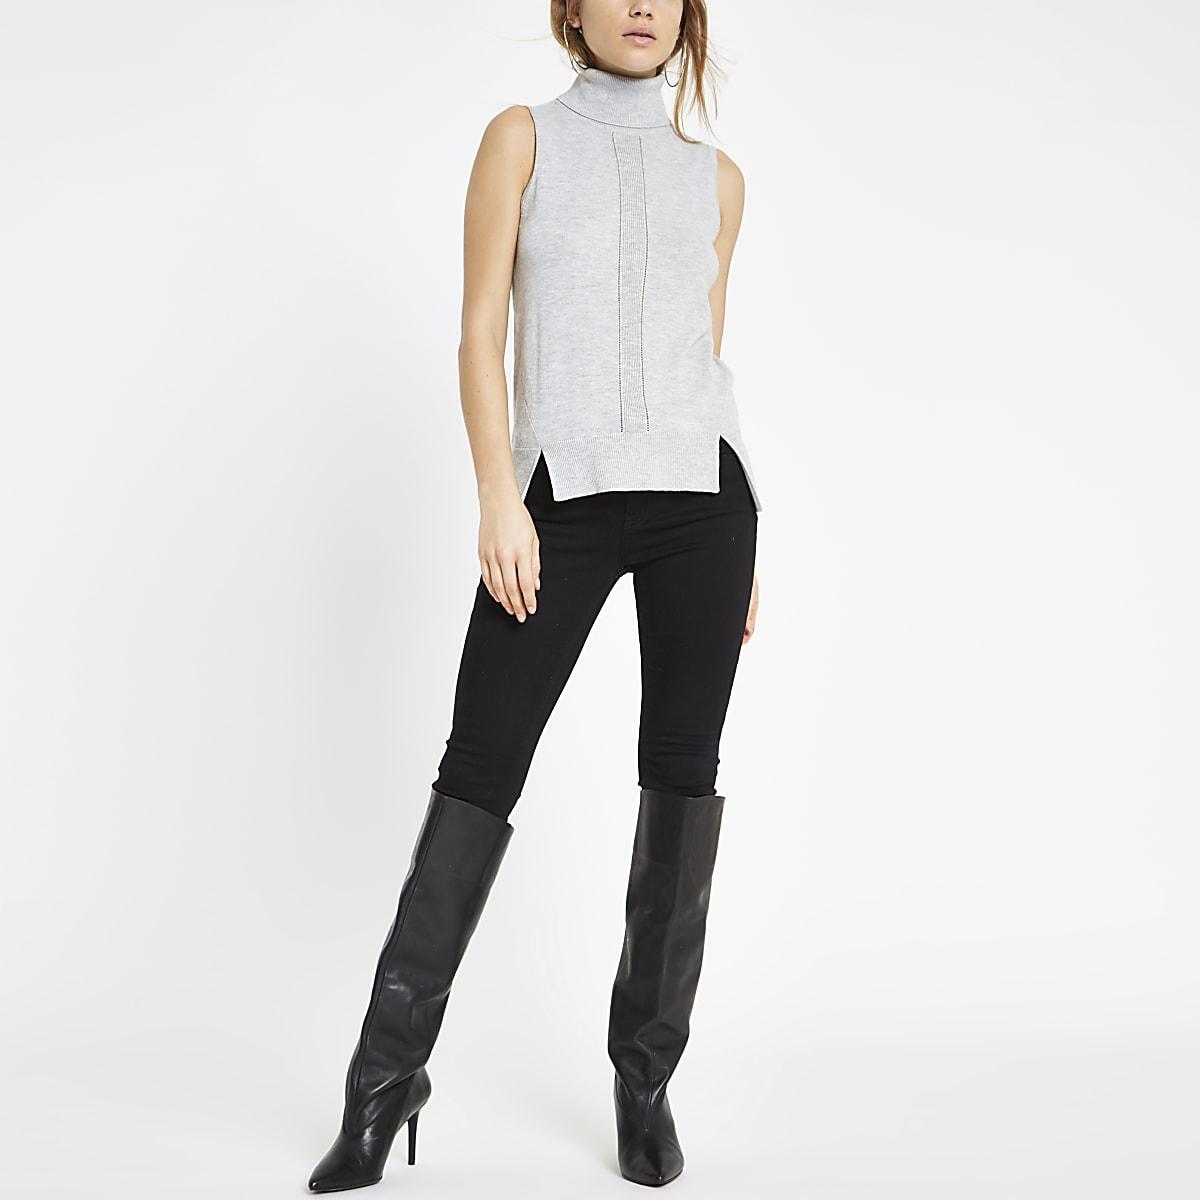 Grey roll neck sleeveless top